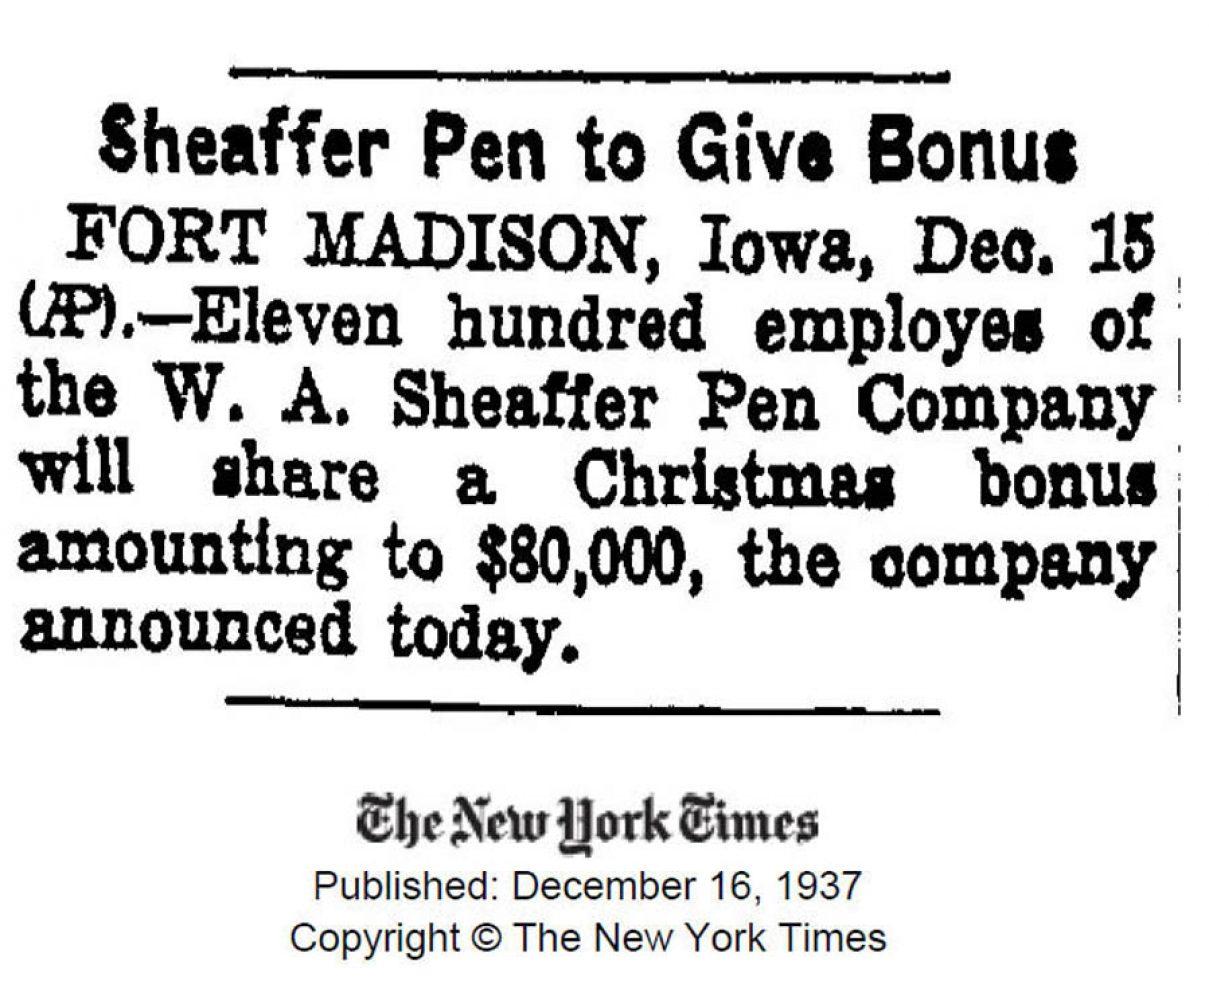 1937 12 16 Sheaffer employes bonus Chritmas Navidades